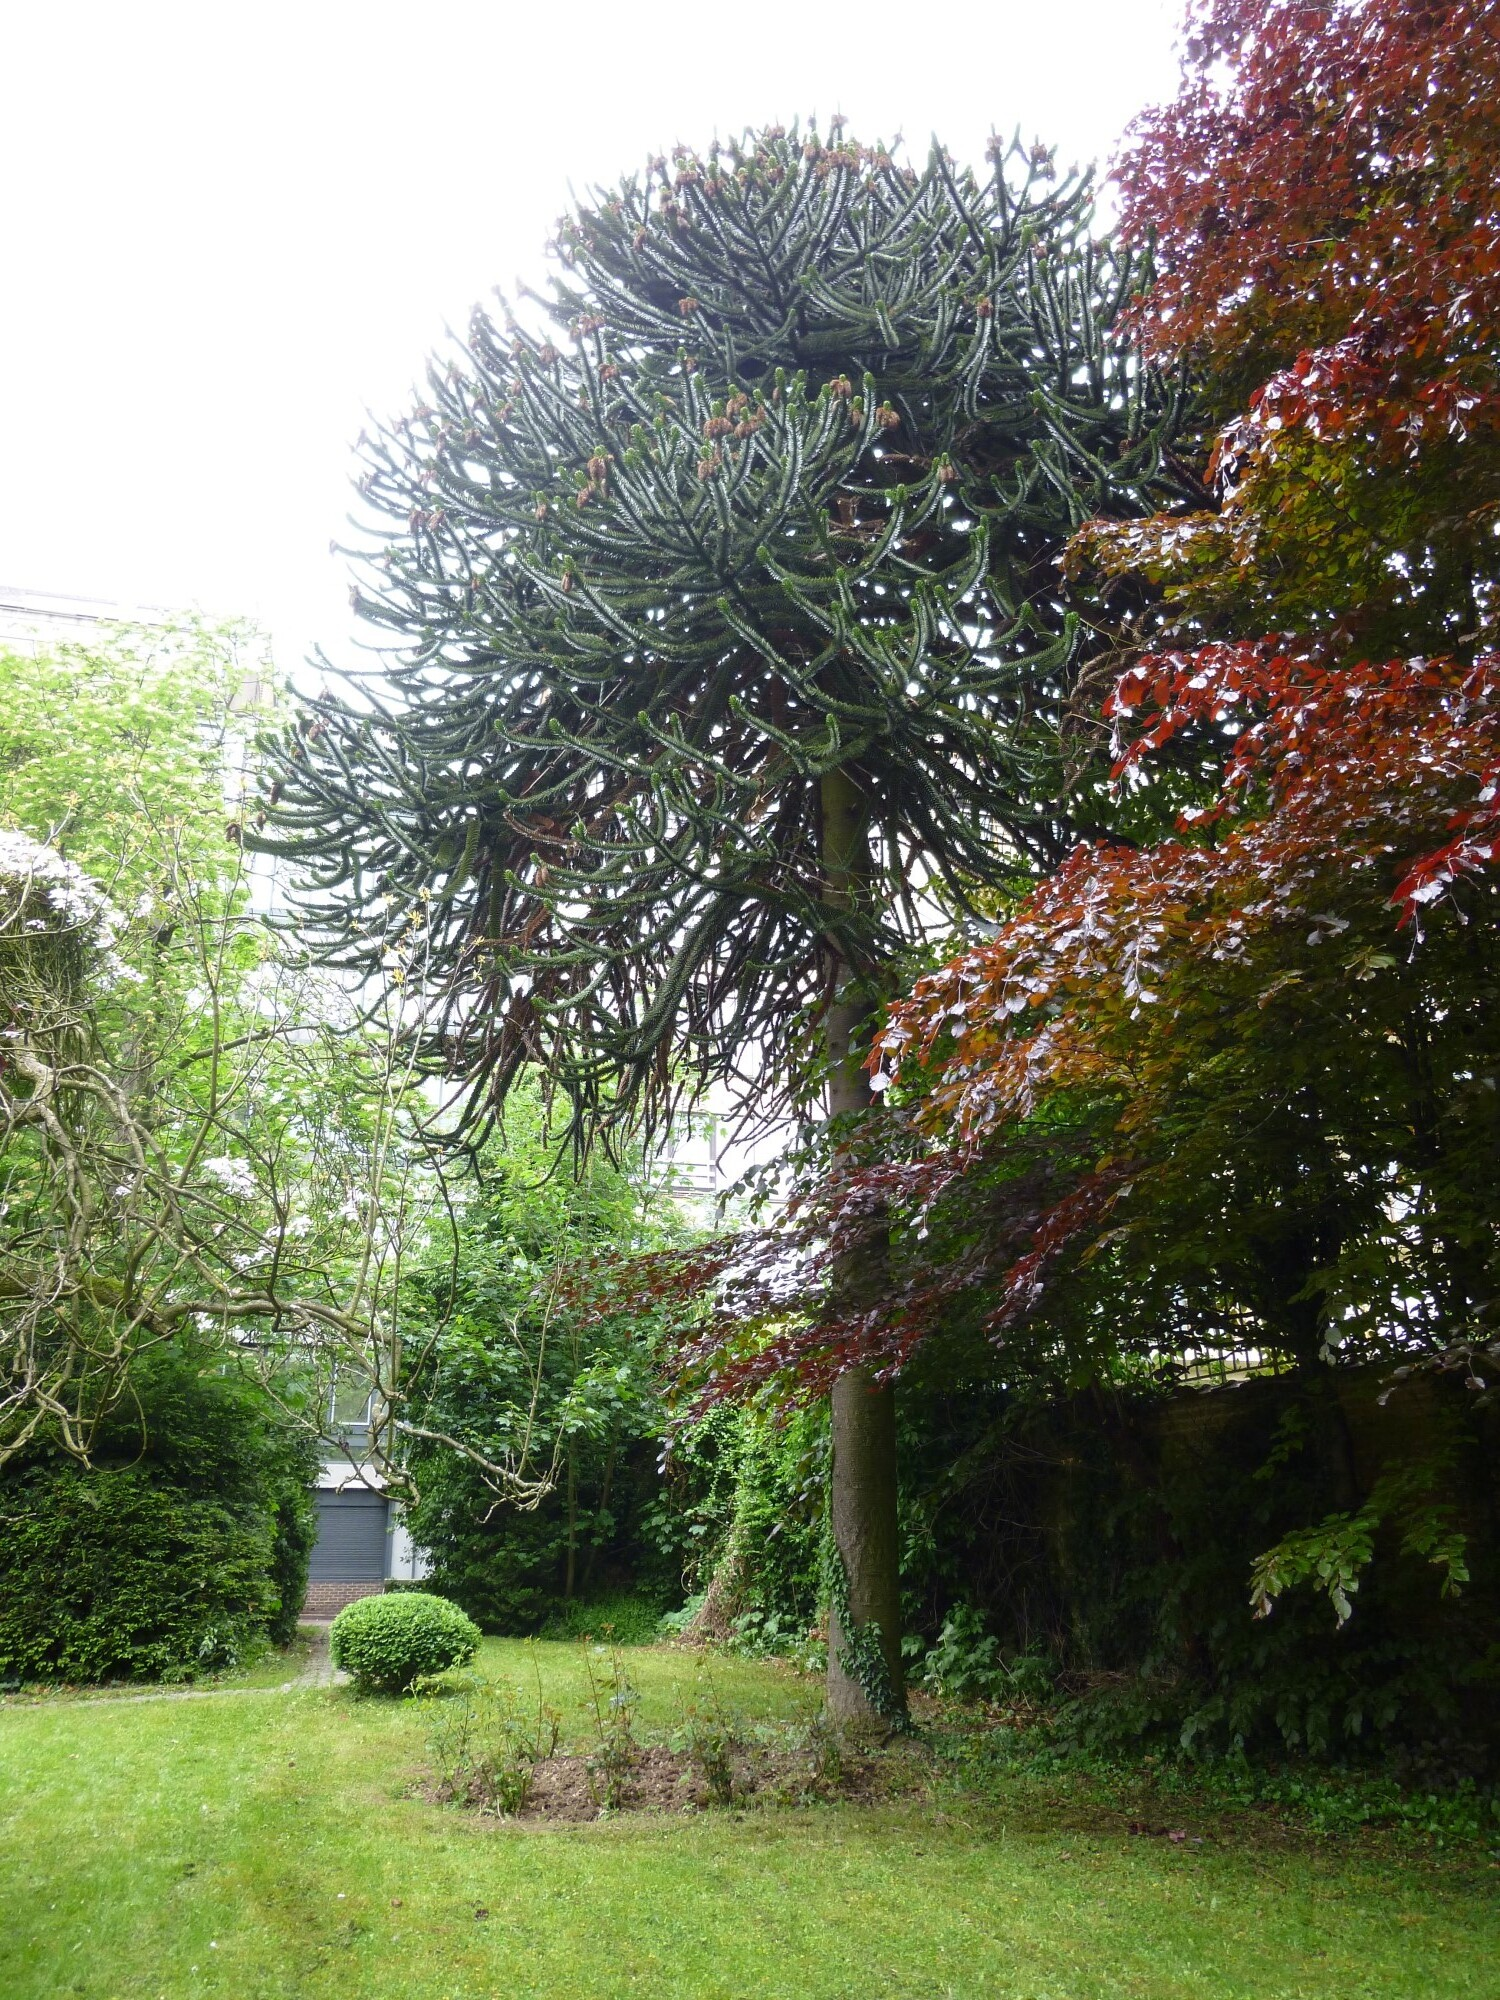 Araucaria du Chili – Ixelles, Rue de Belle-Vue, 18 –  22 Mai 2013